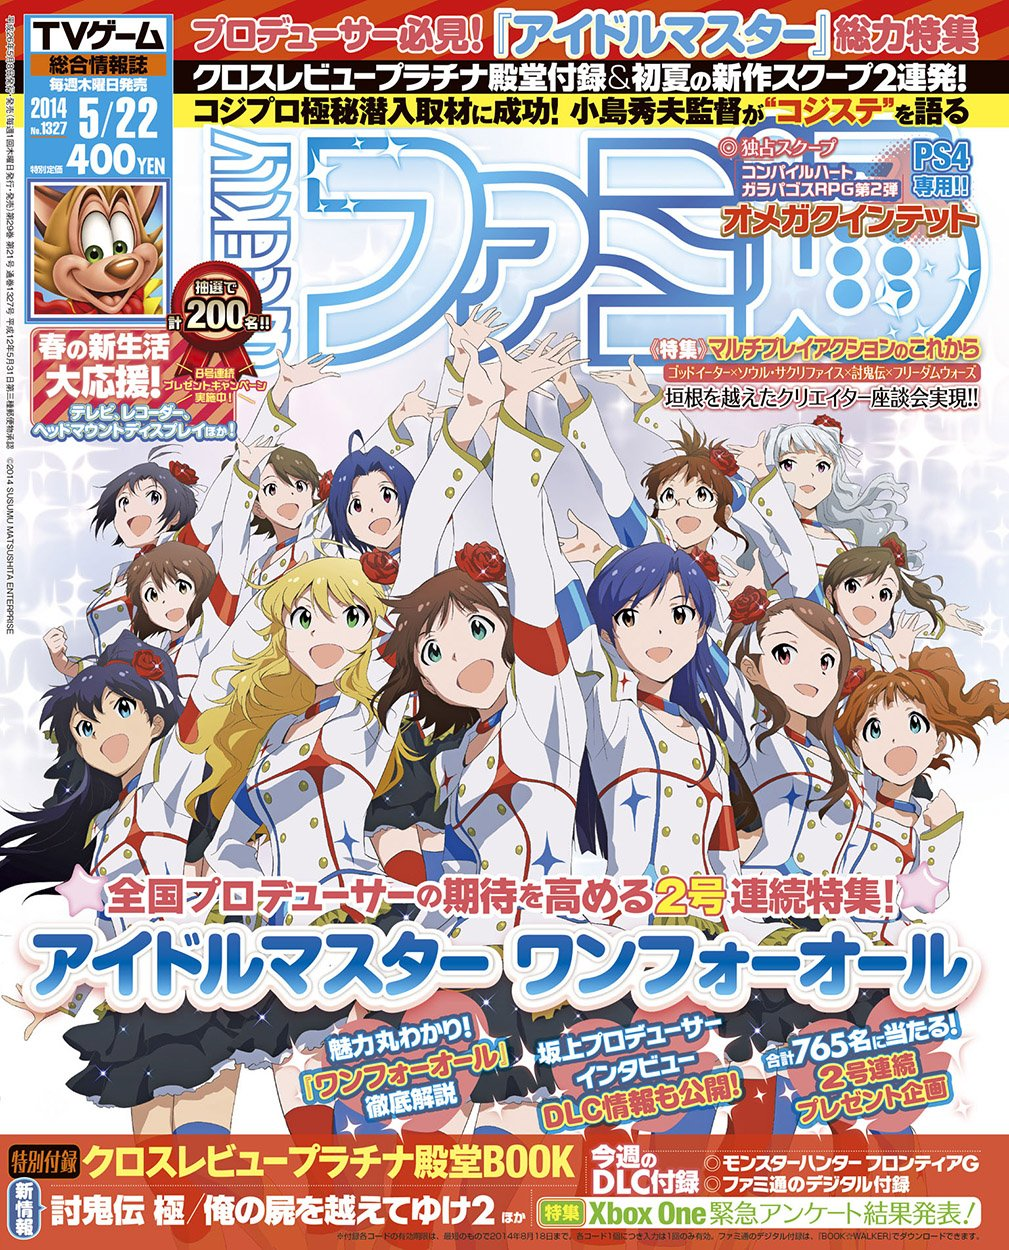 Famitsu 1327 May 22, 2014